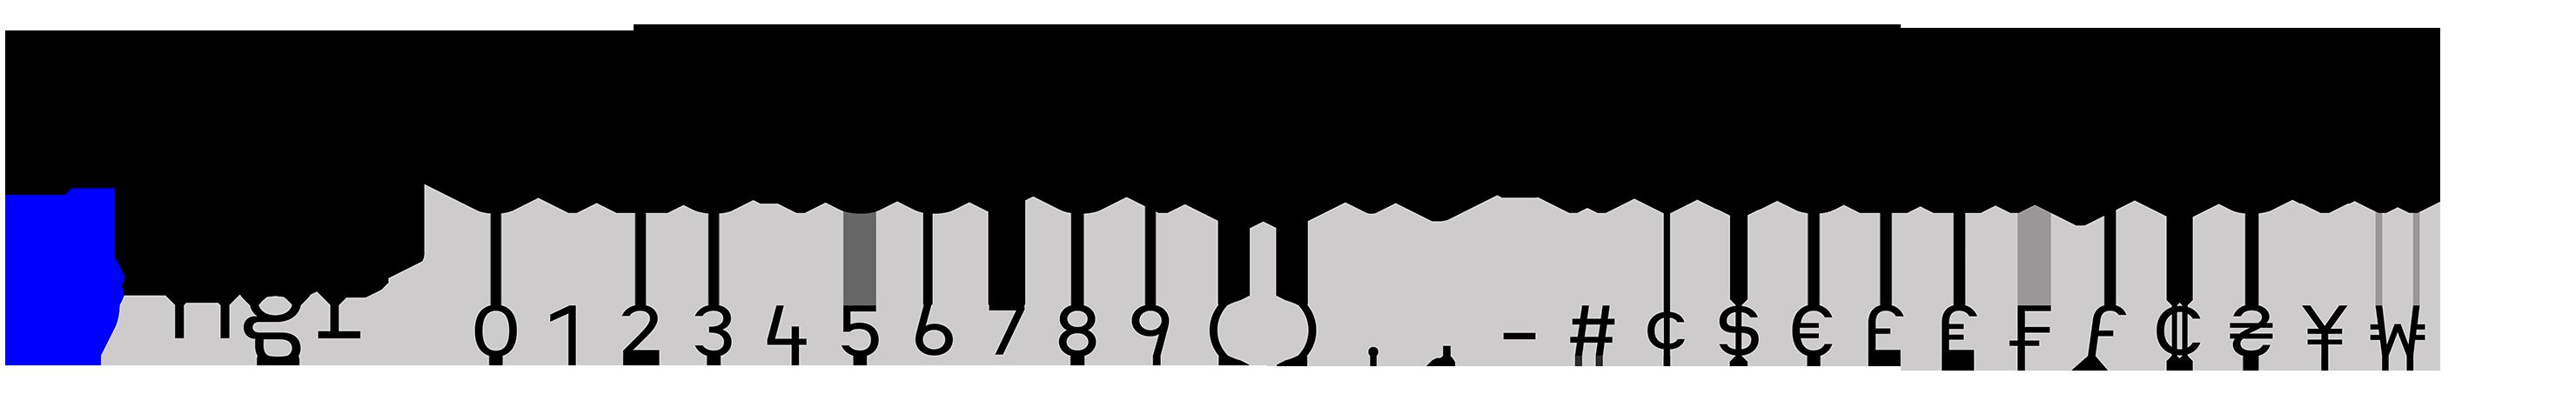 Typeface-Heimat-Mono-F12-Atlas-Font-Foundry